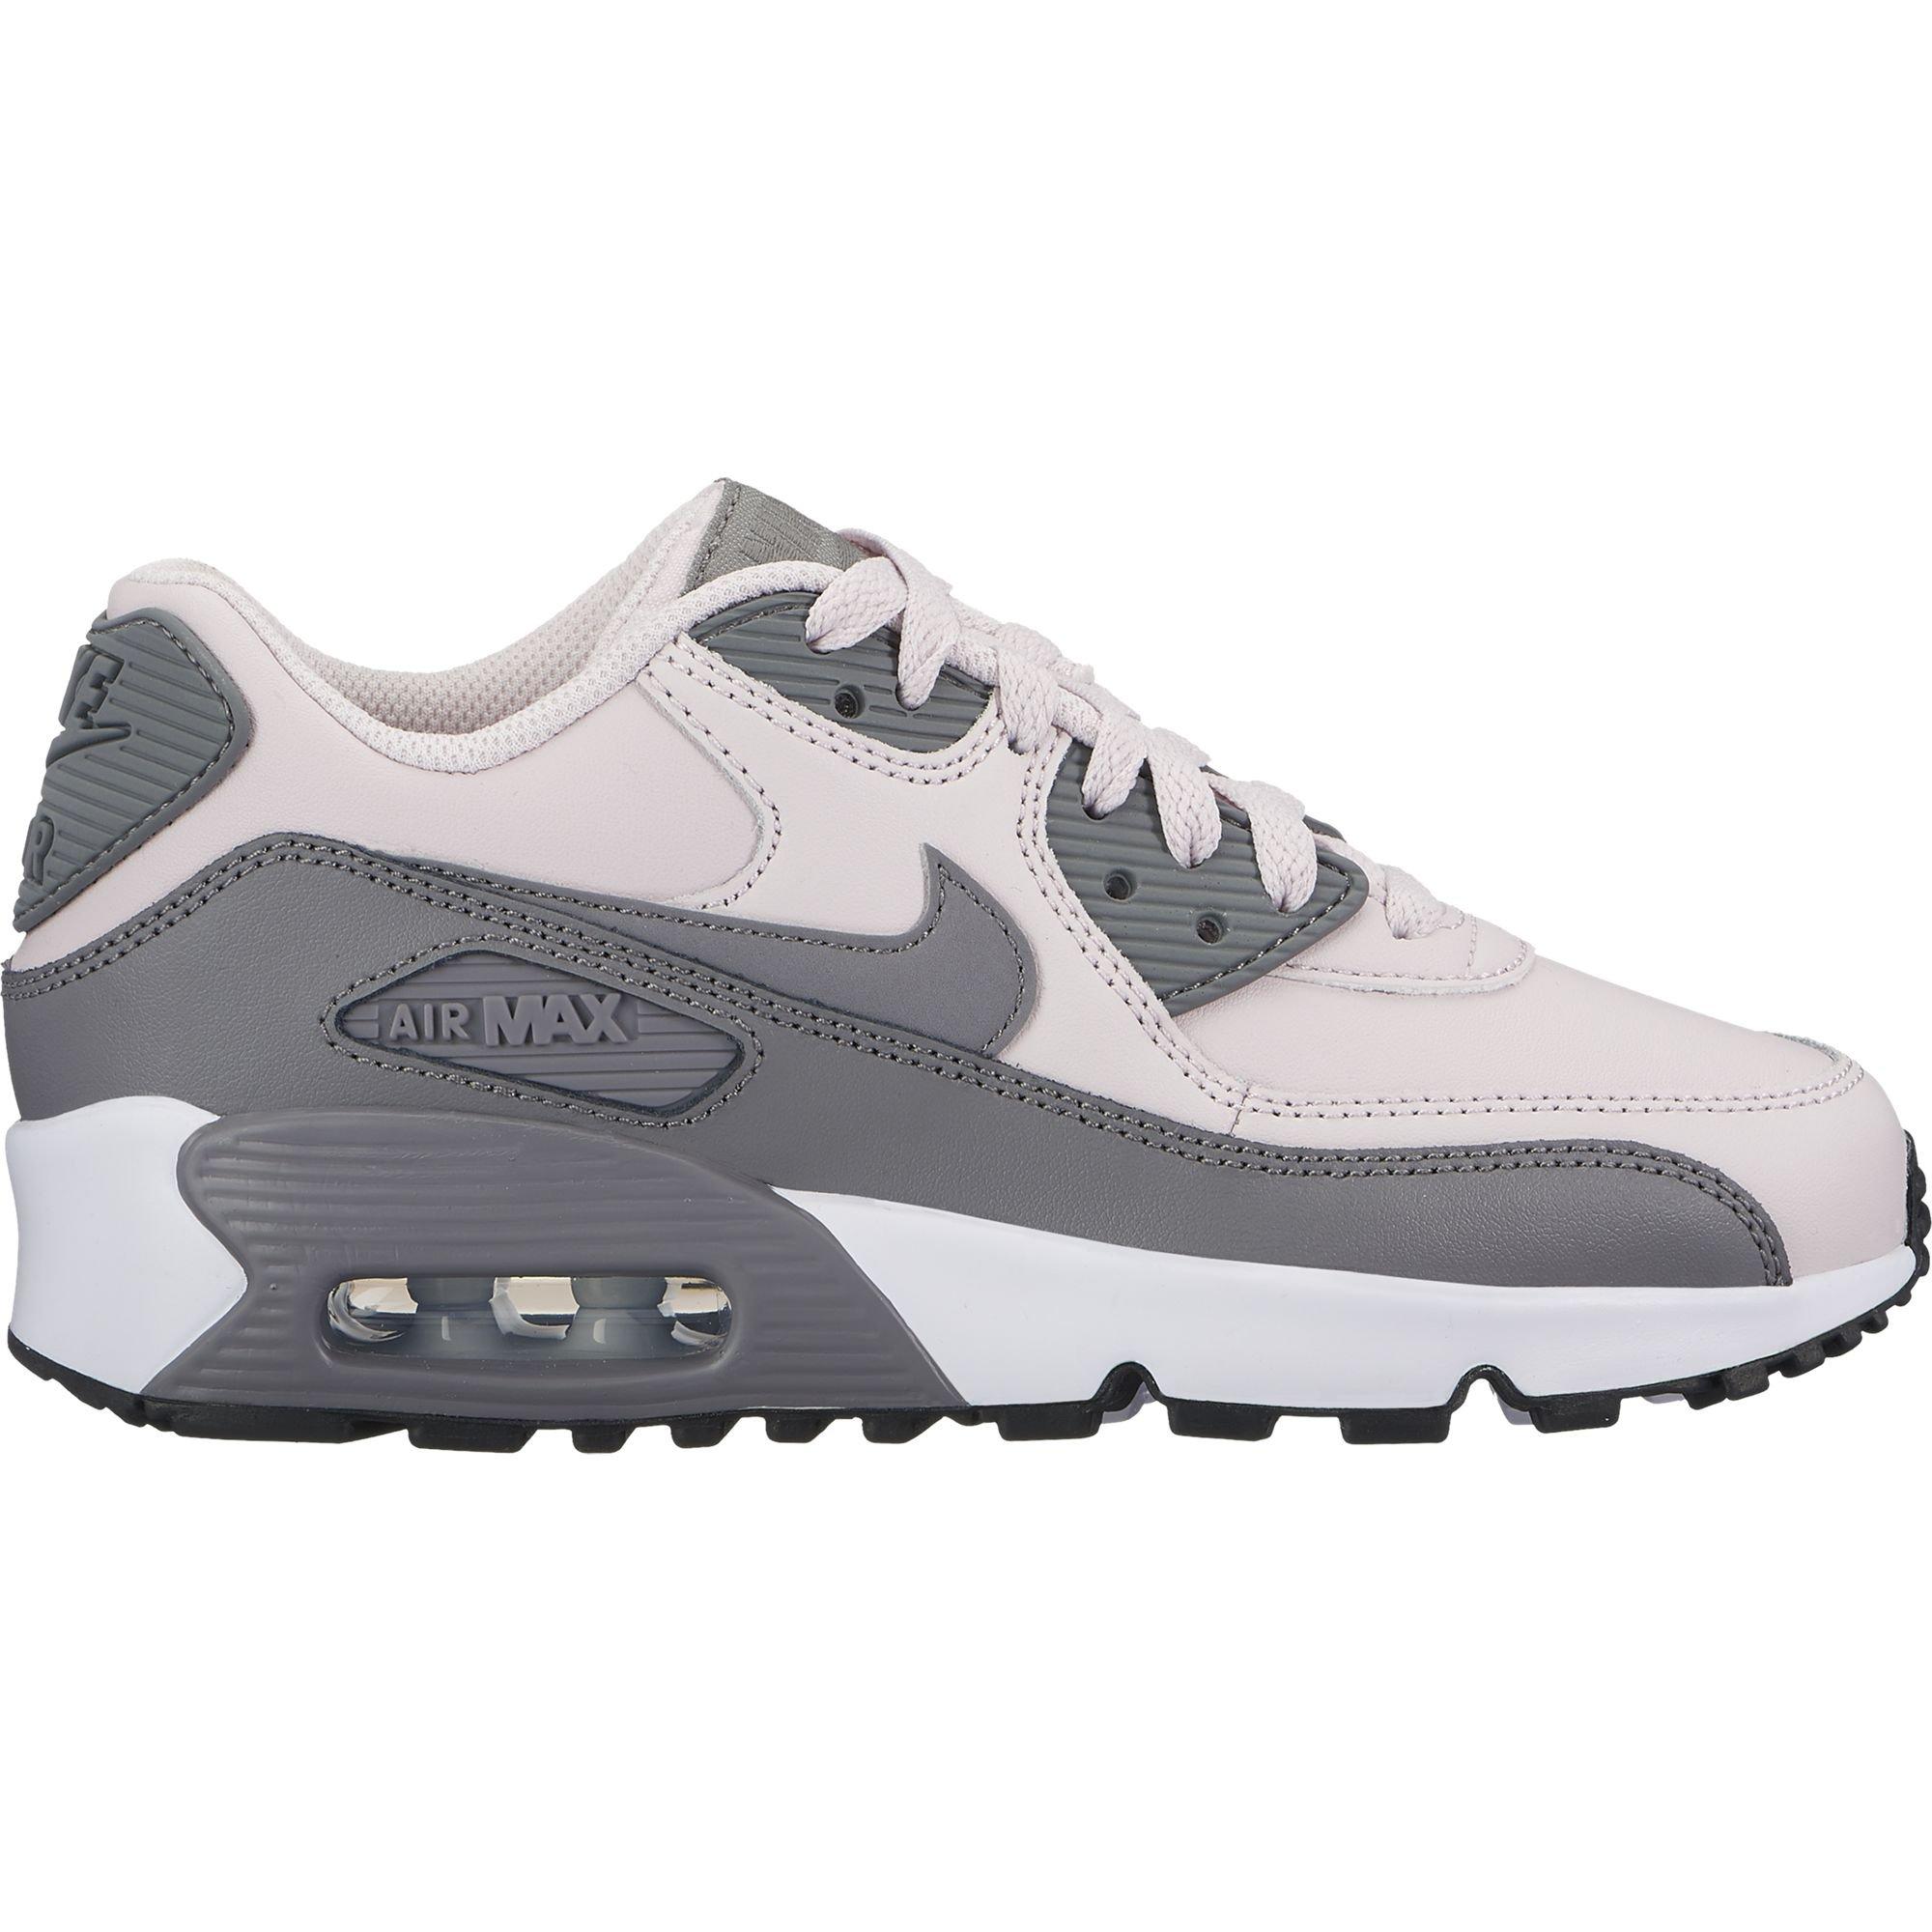 125fedb5a5 Galleon - Nike Air Max 90 LTR Girl's Shoe, Barely Rose/Gunsmoke-White-Black,  7Y